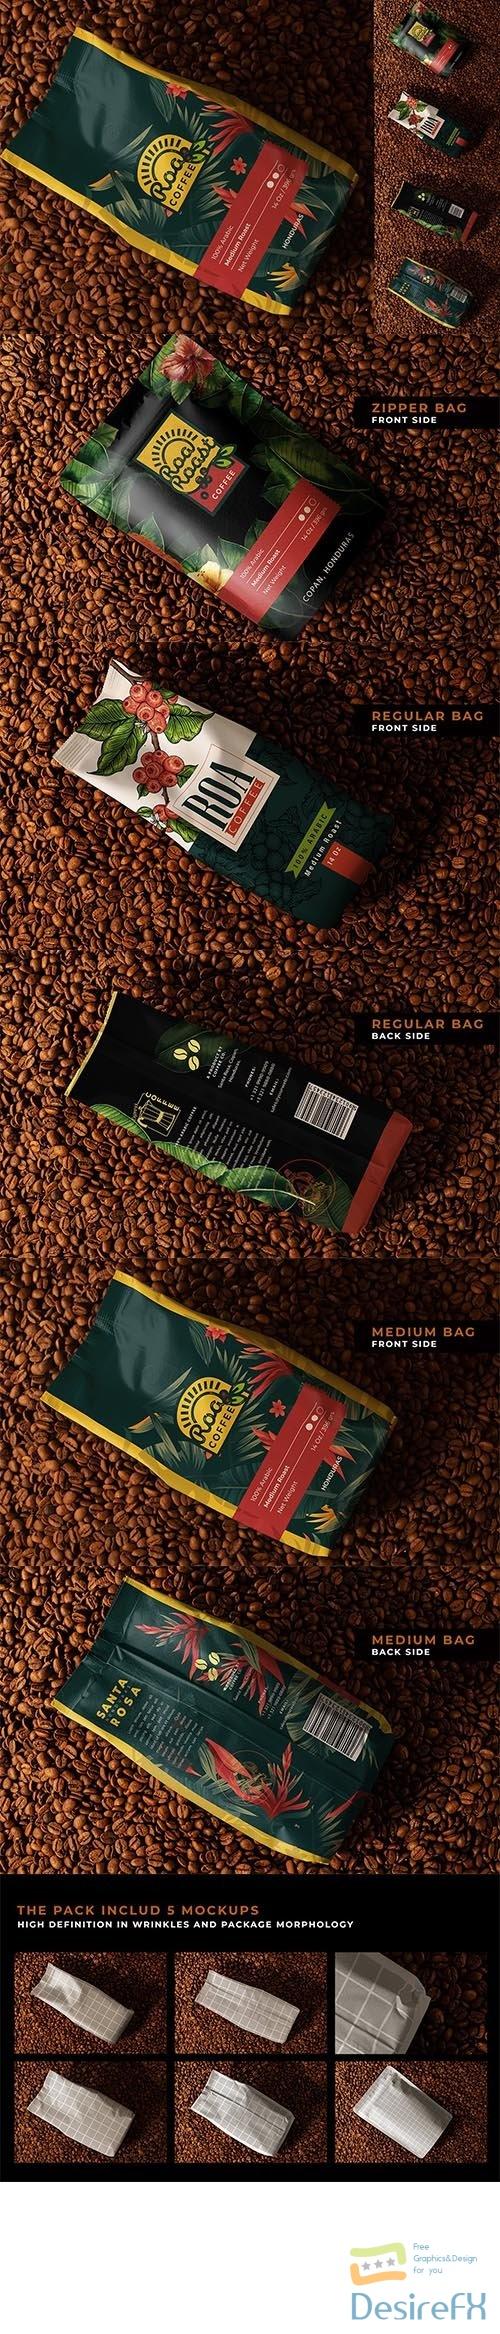 CreativeMarket - Coffee Package Mockup Set 6481546